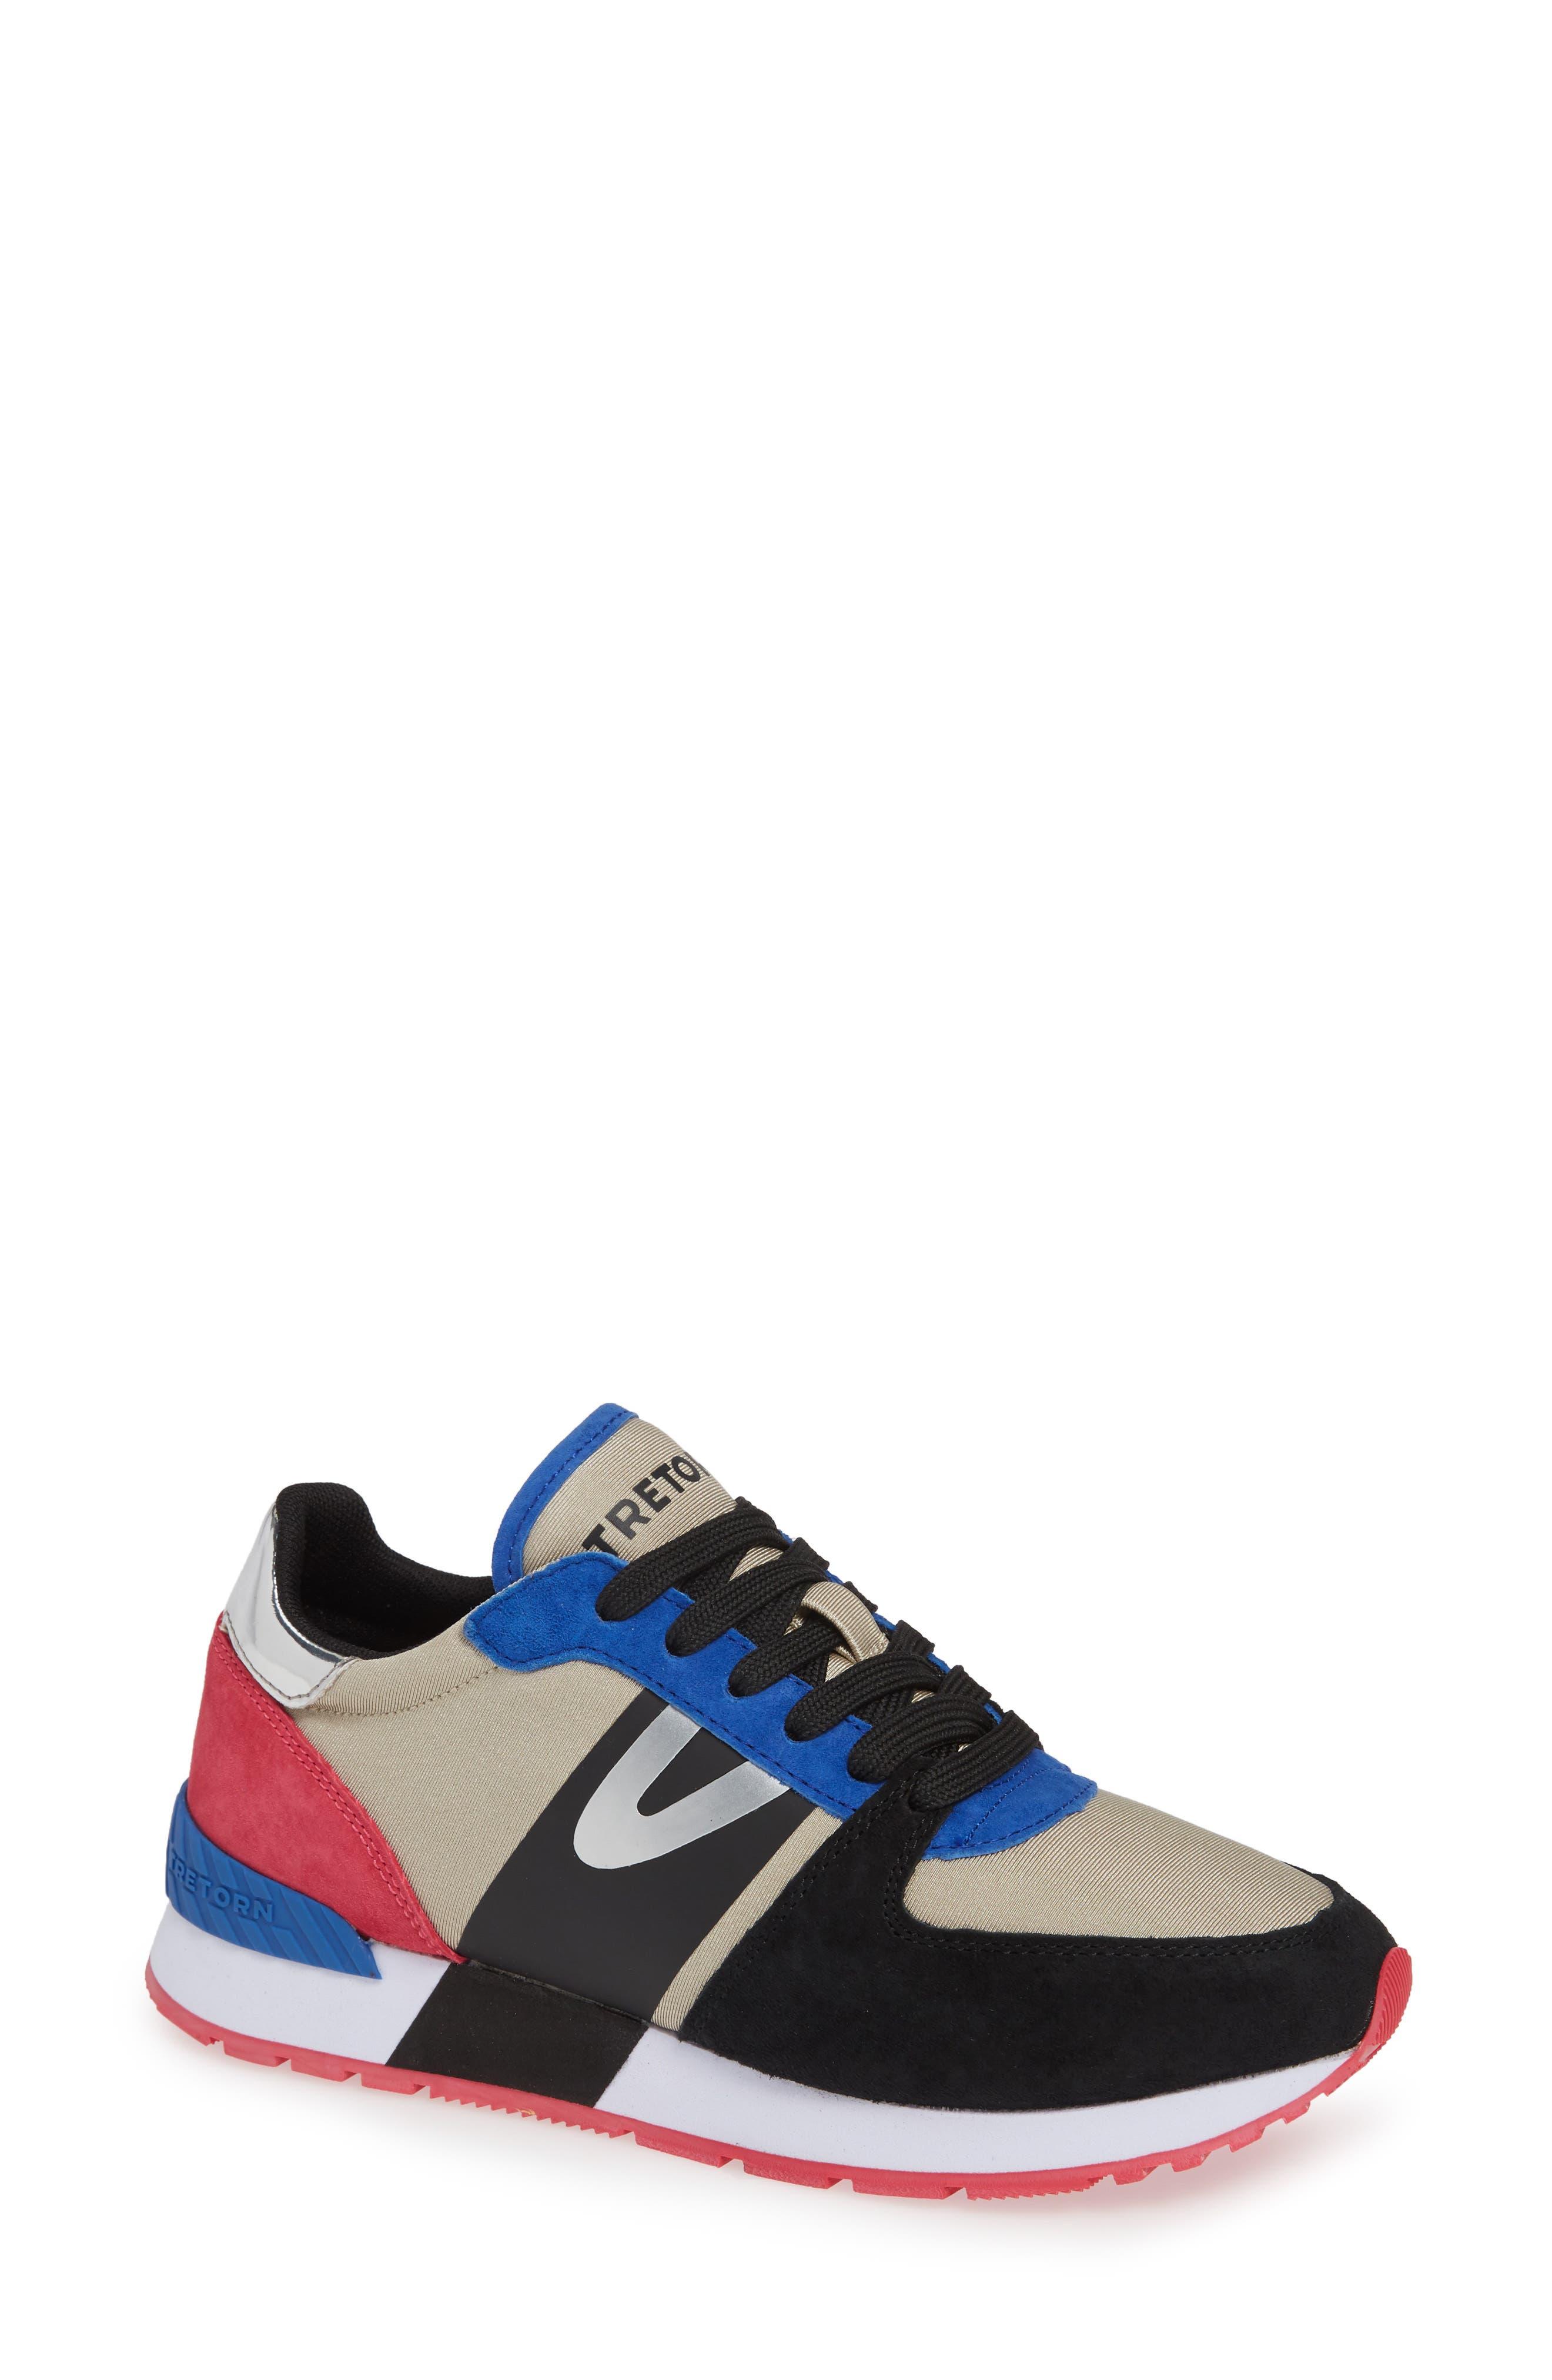 TRETORN,                             Loyola3 Sneaker,                             Main thumbnail 1, color,                             GLACIER GREY/ MARSHMALLOW